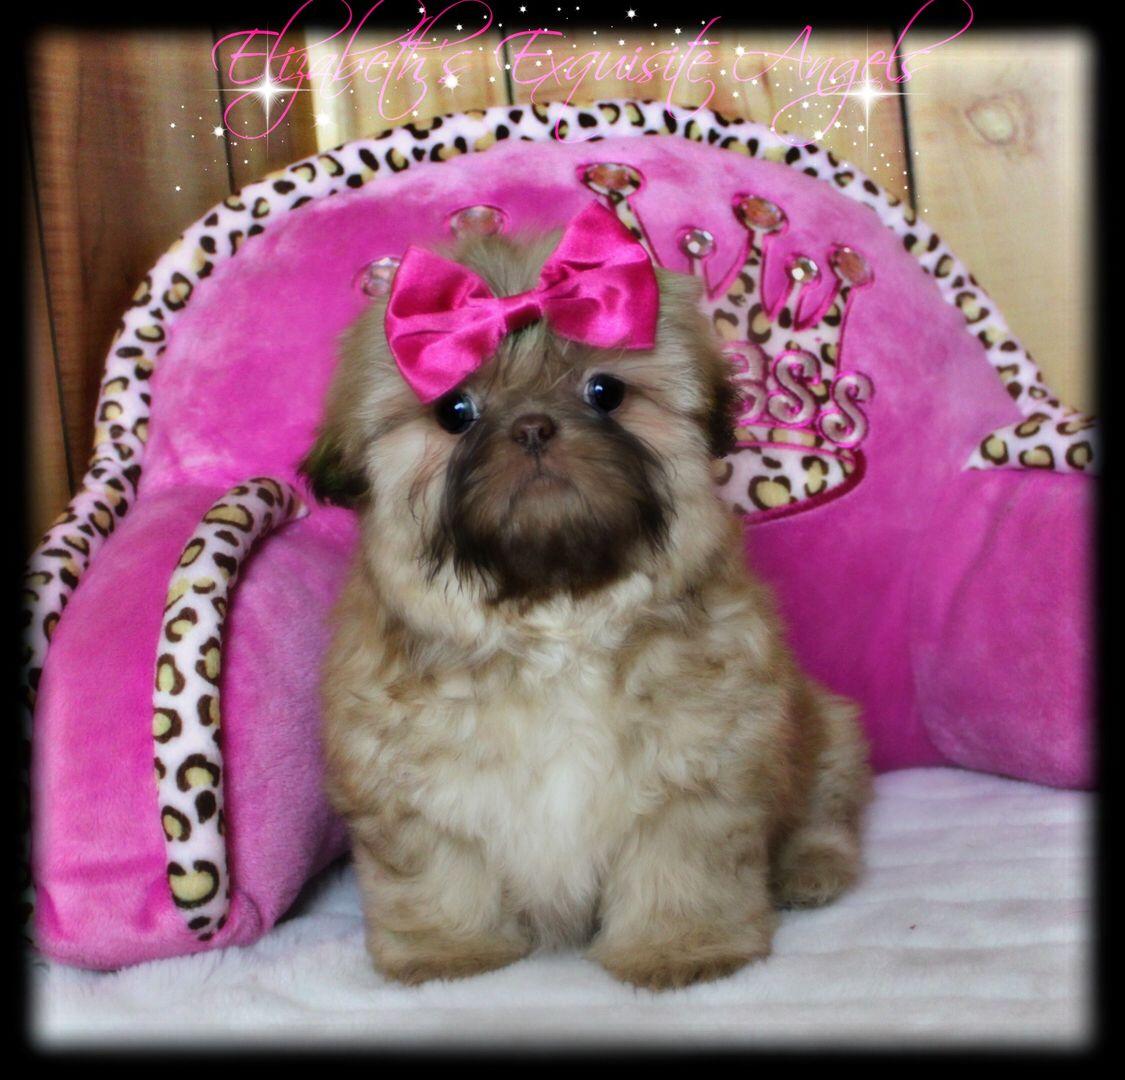 Cutest little Imperial ShihTzu!!Love this puppy